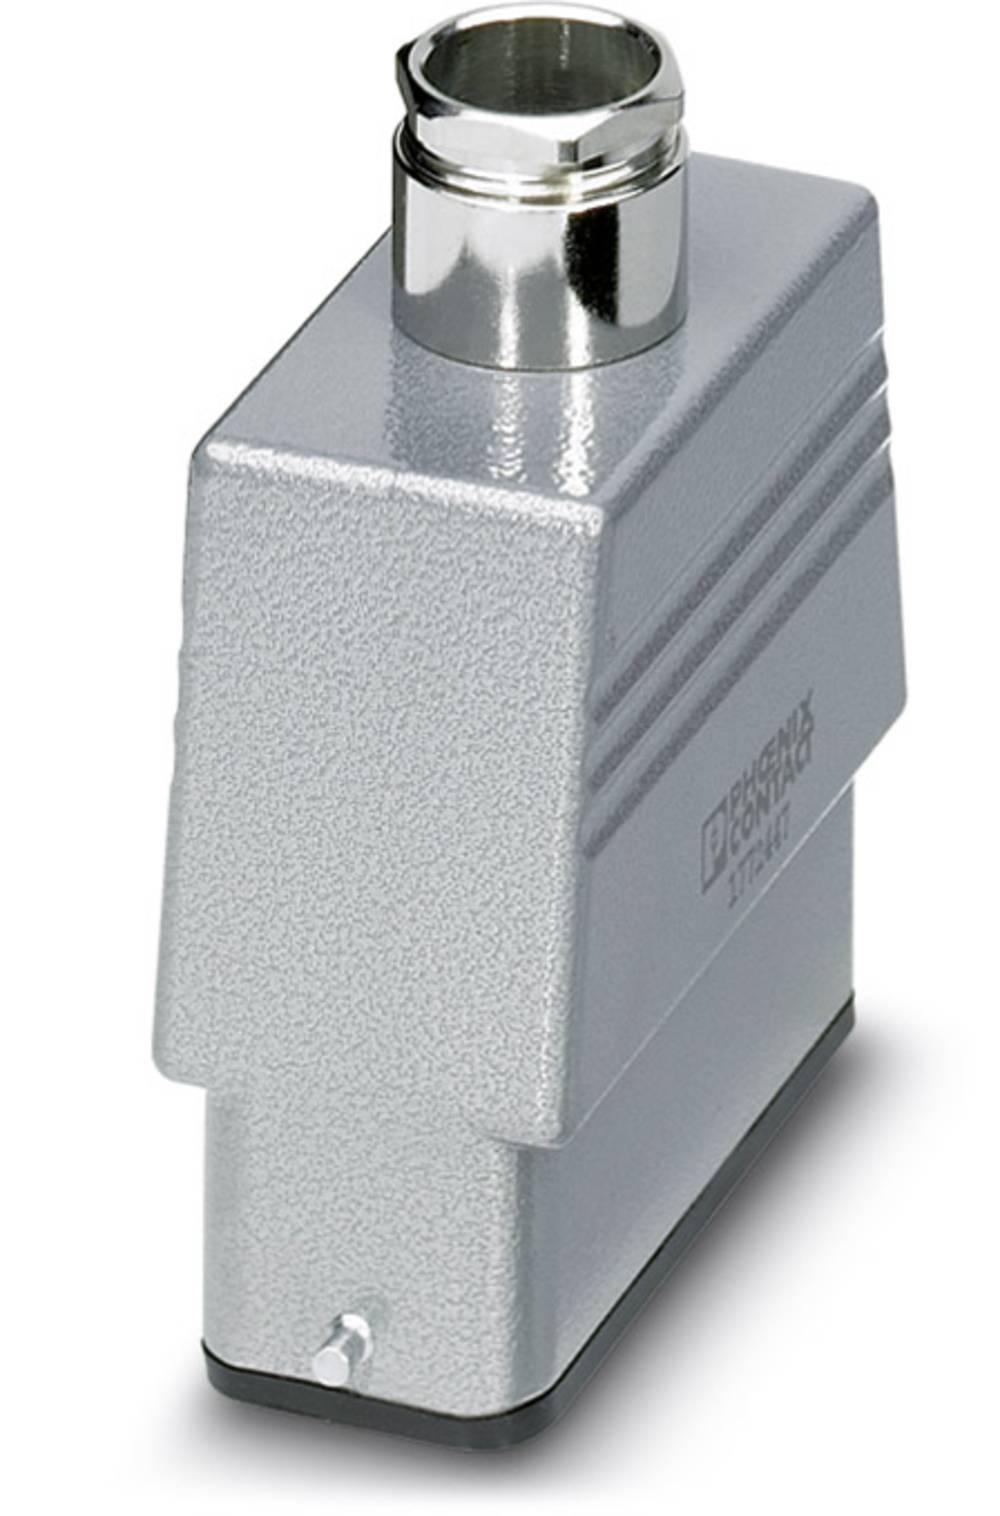 Tyllehus Phoenix Contact HC-D 25-TFL-72 / M1PG16G 10 stk